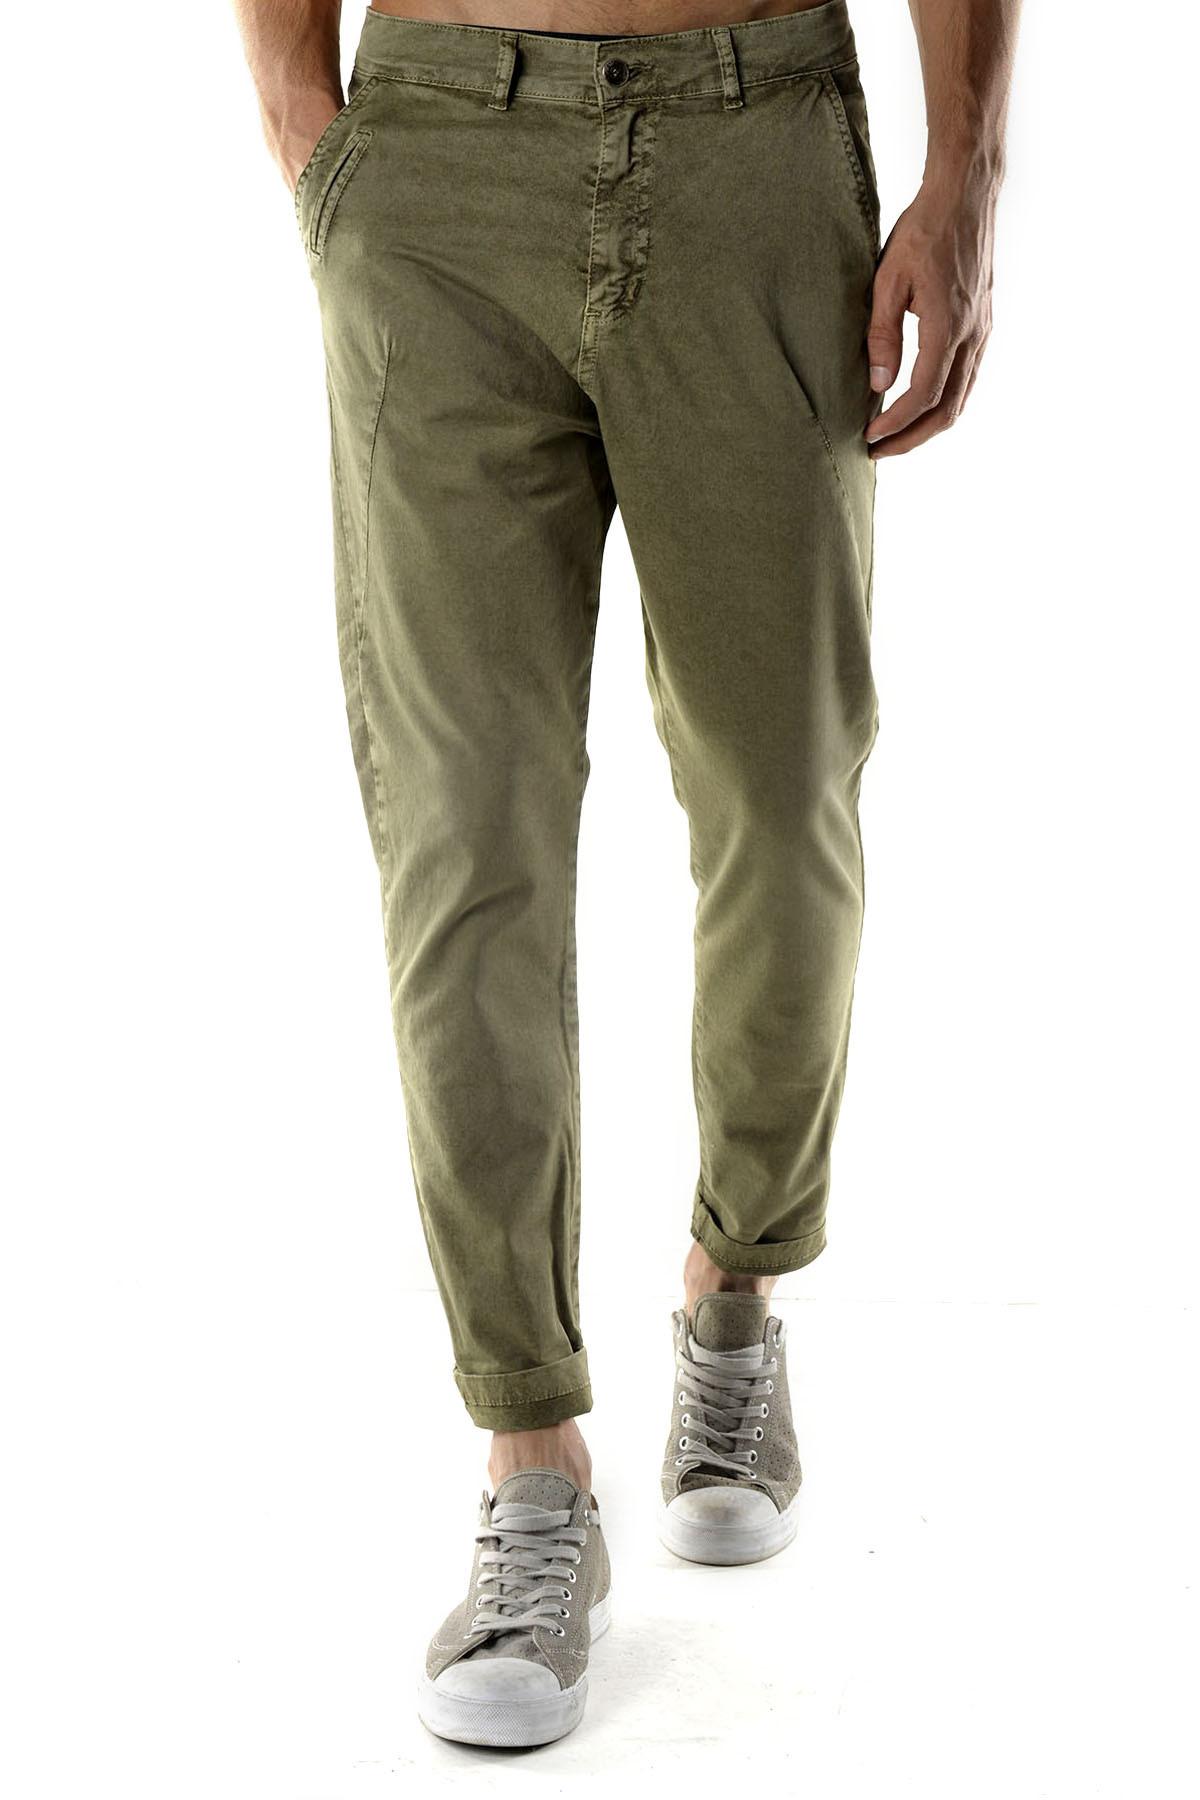 Marchio Absolut Joy Genere Uomo Tipologia Pantaloni Stagione Primavera/Esta…